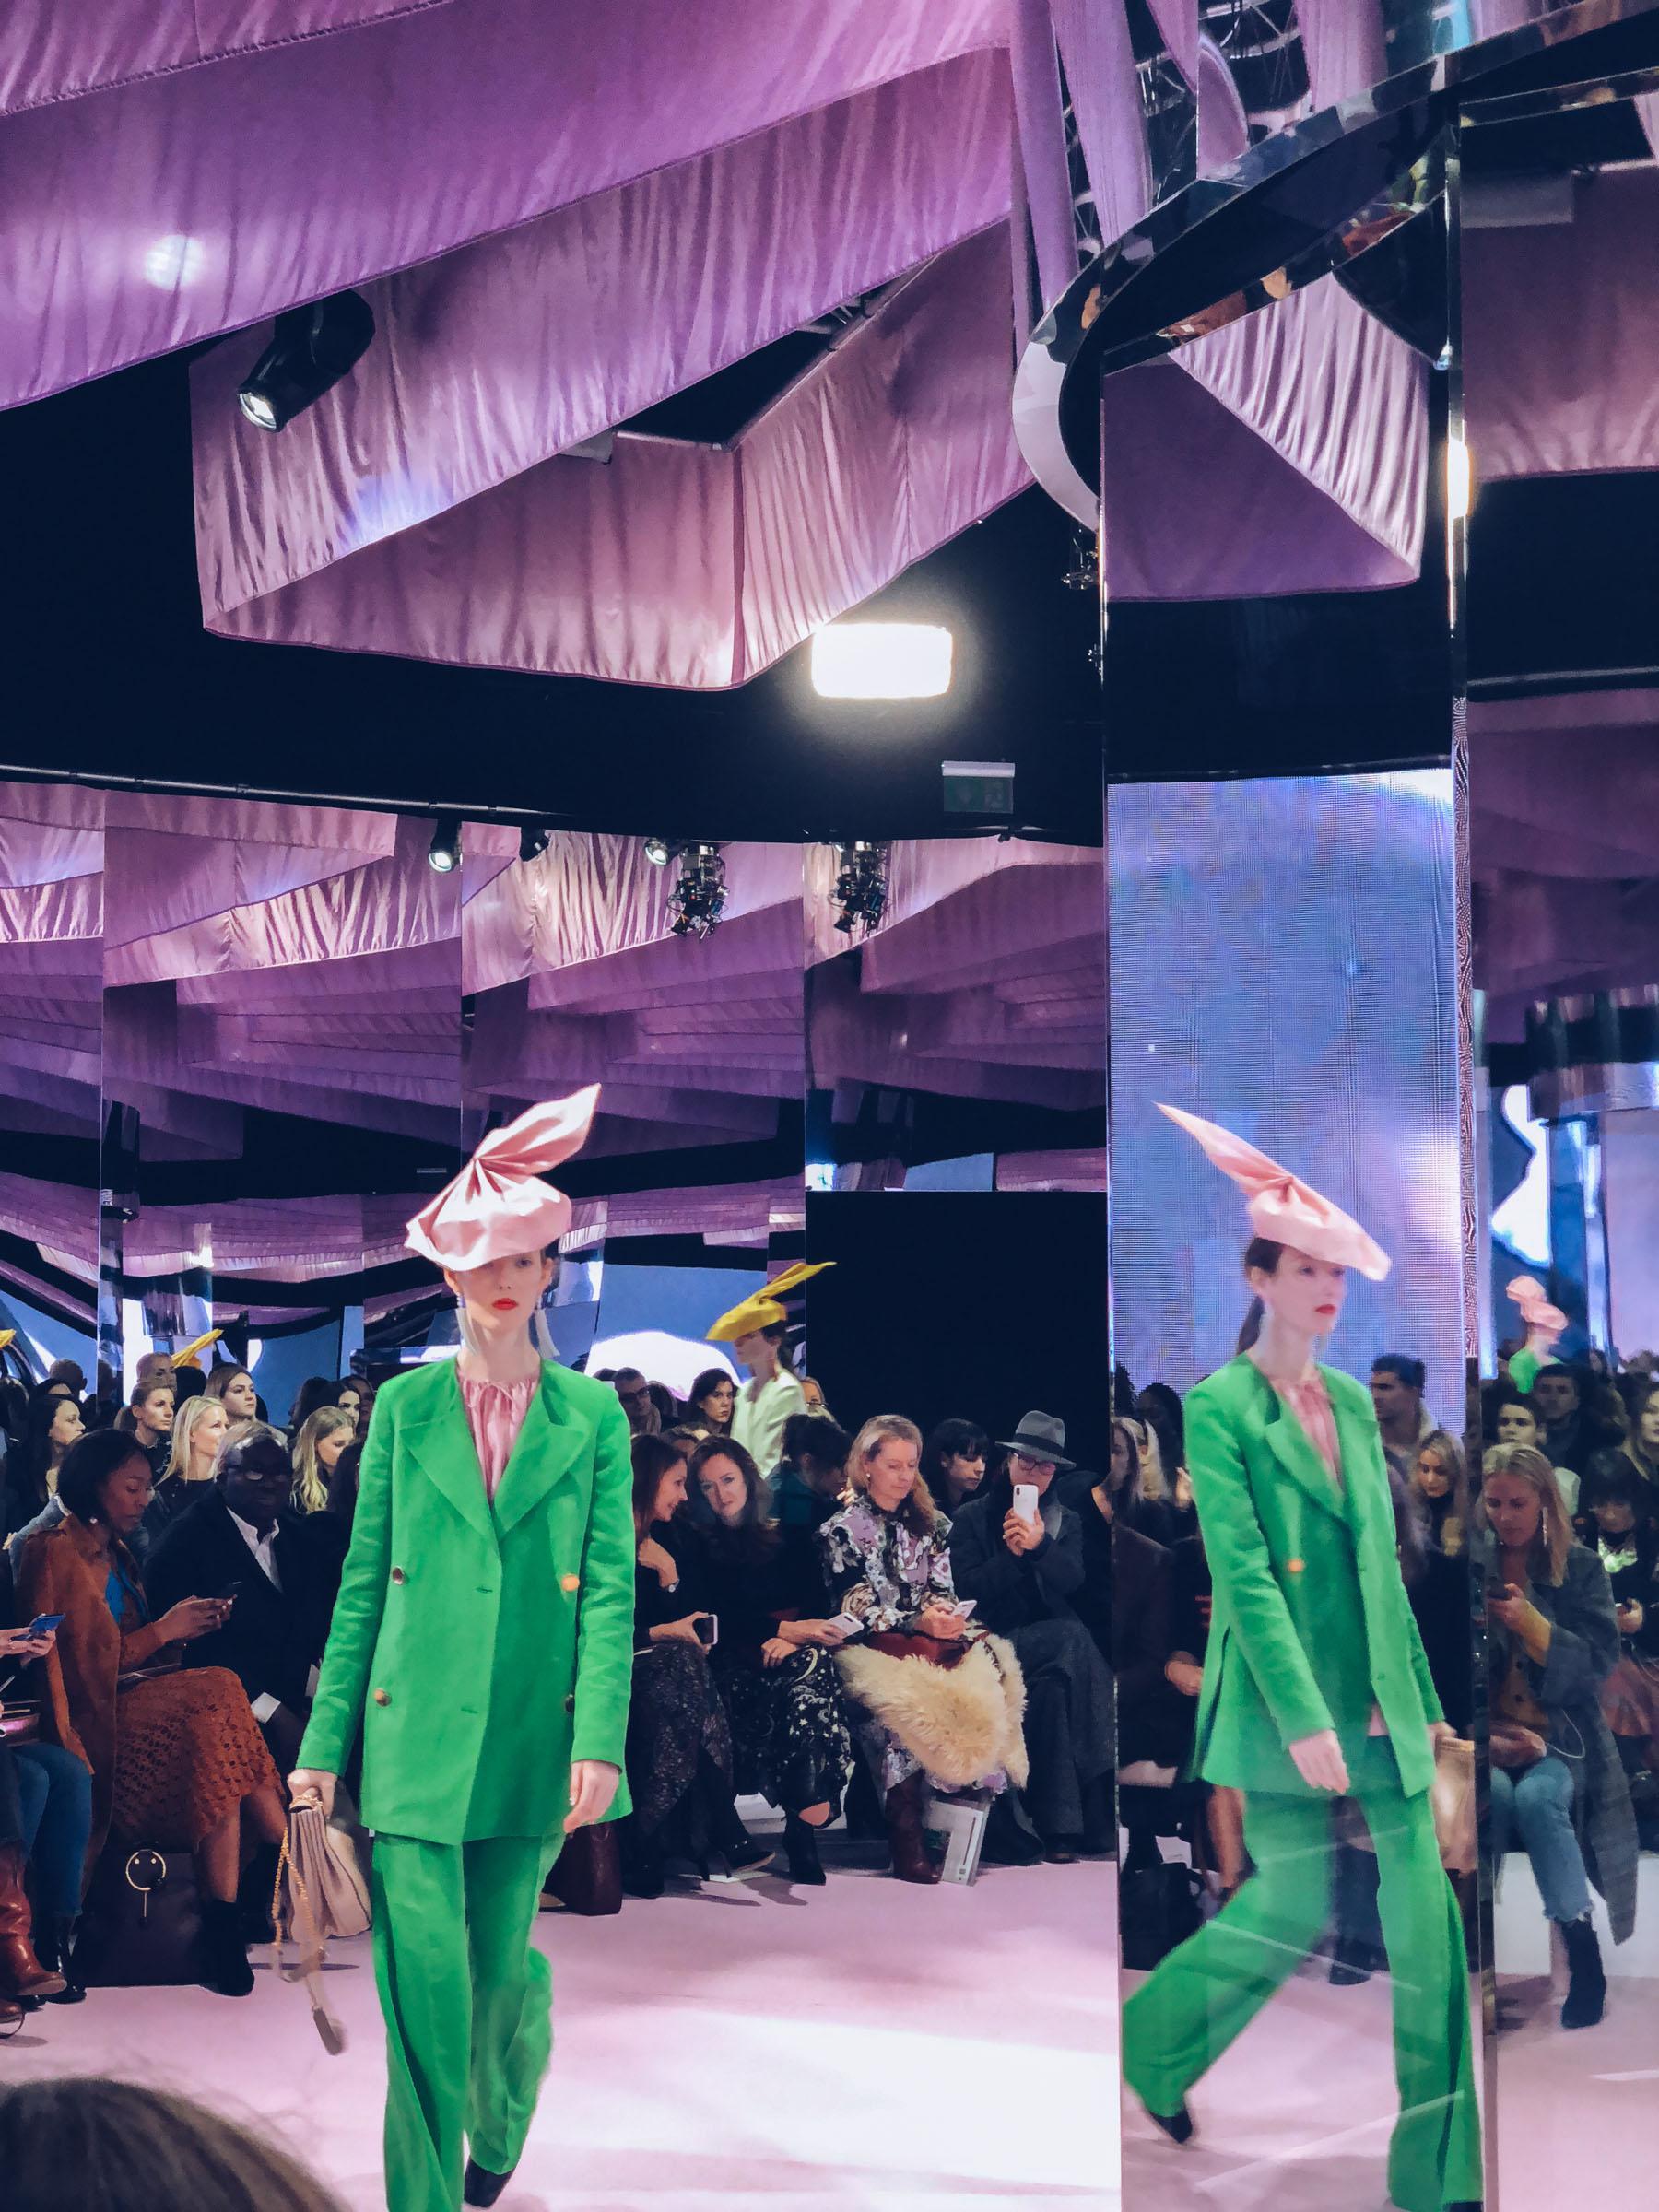 London Fashion Week Recap - Mulberry fw18 show // Notjessfashion.com